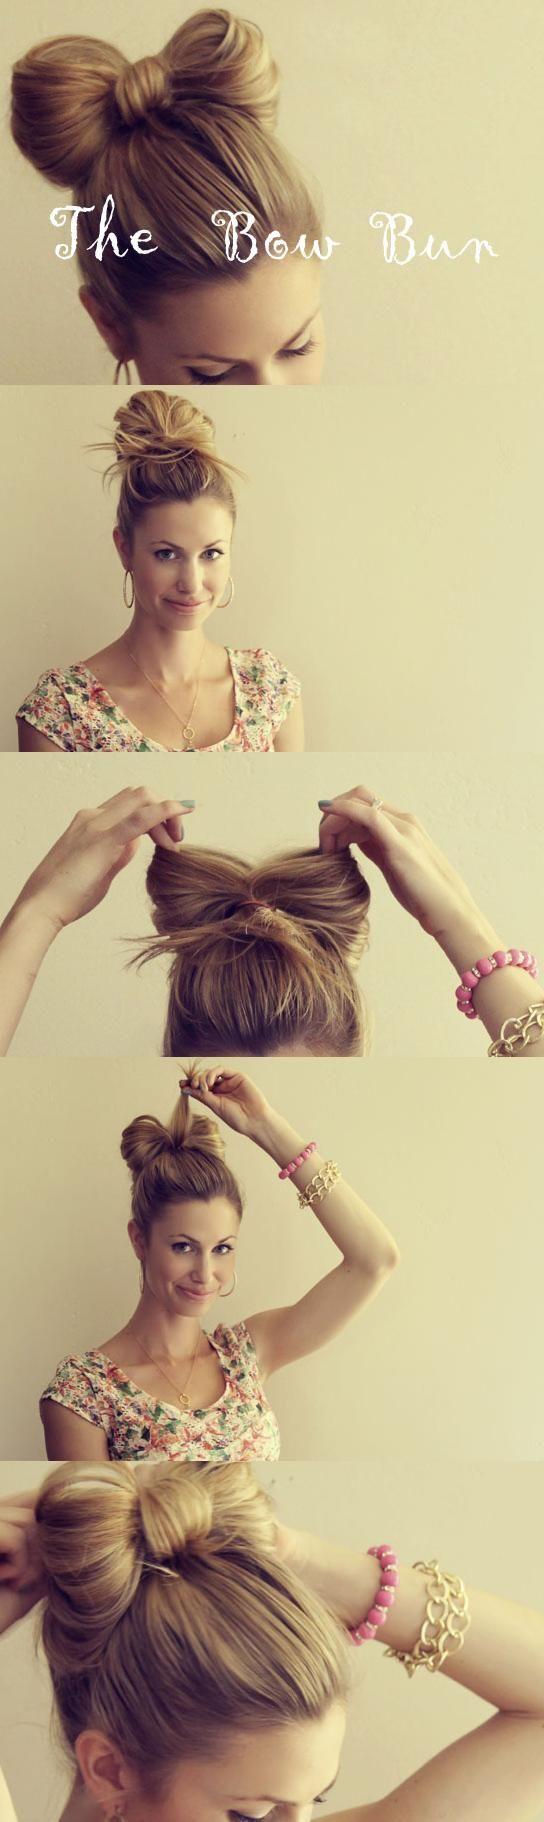 So cute cute hairstyles pinterest bow buns easy and hair style